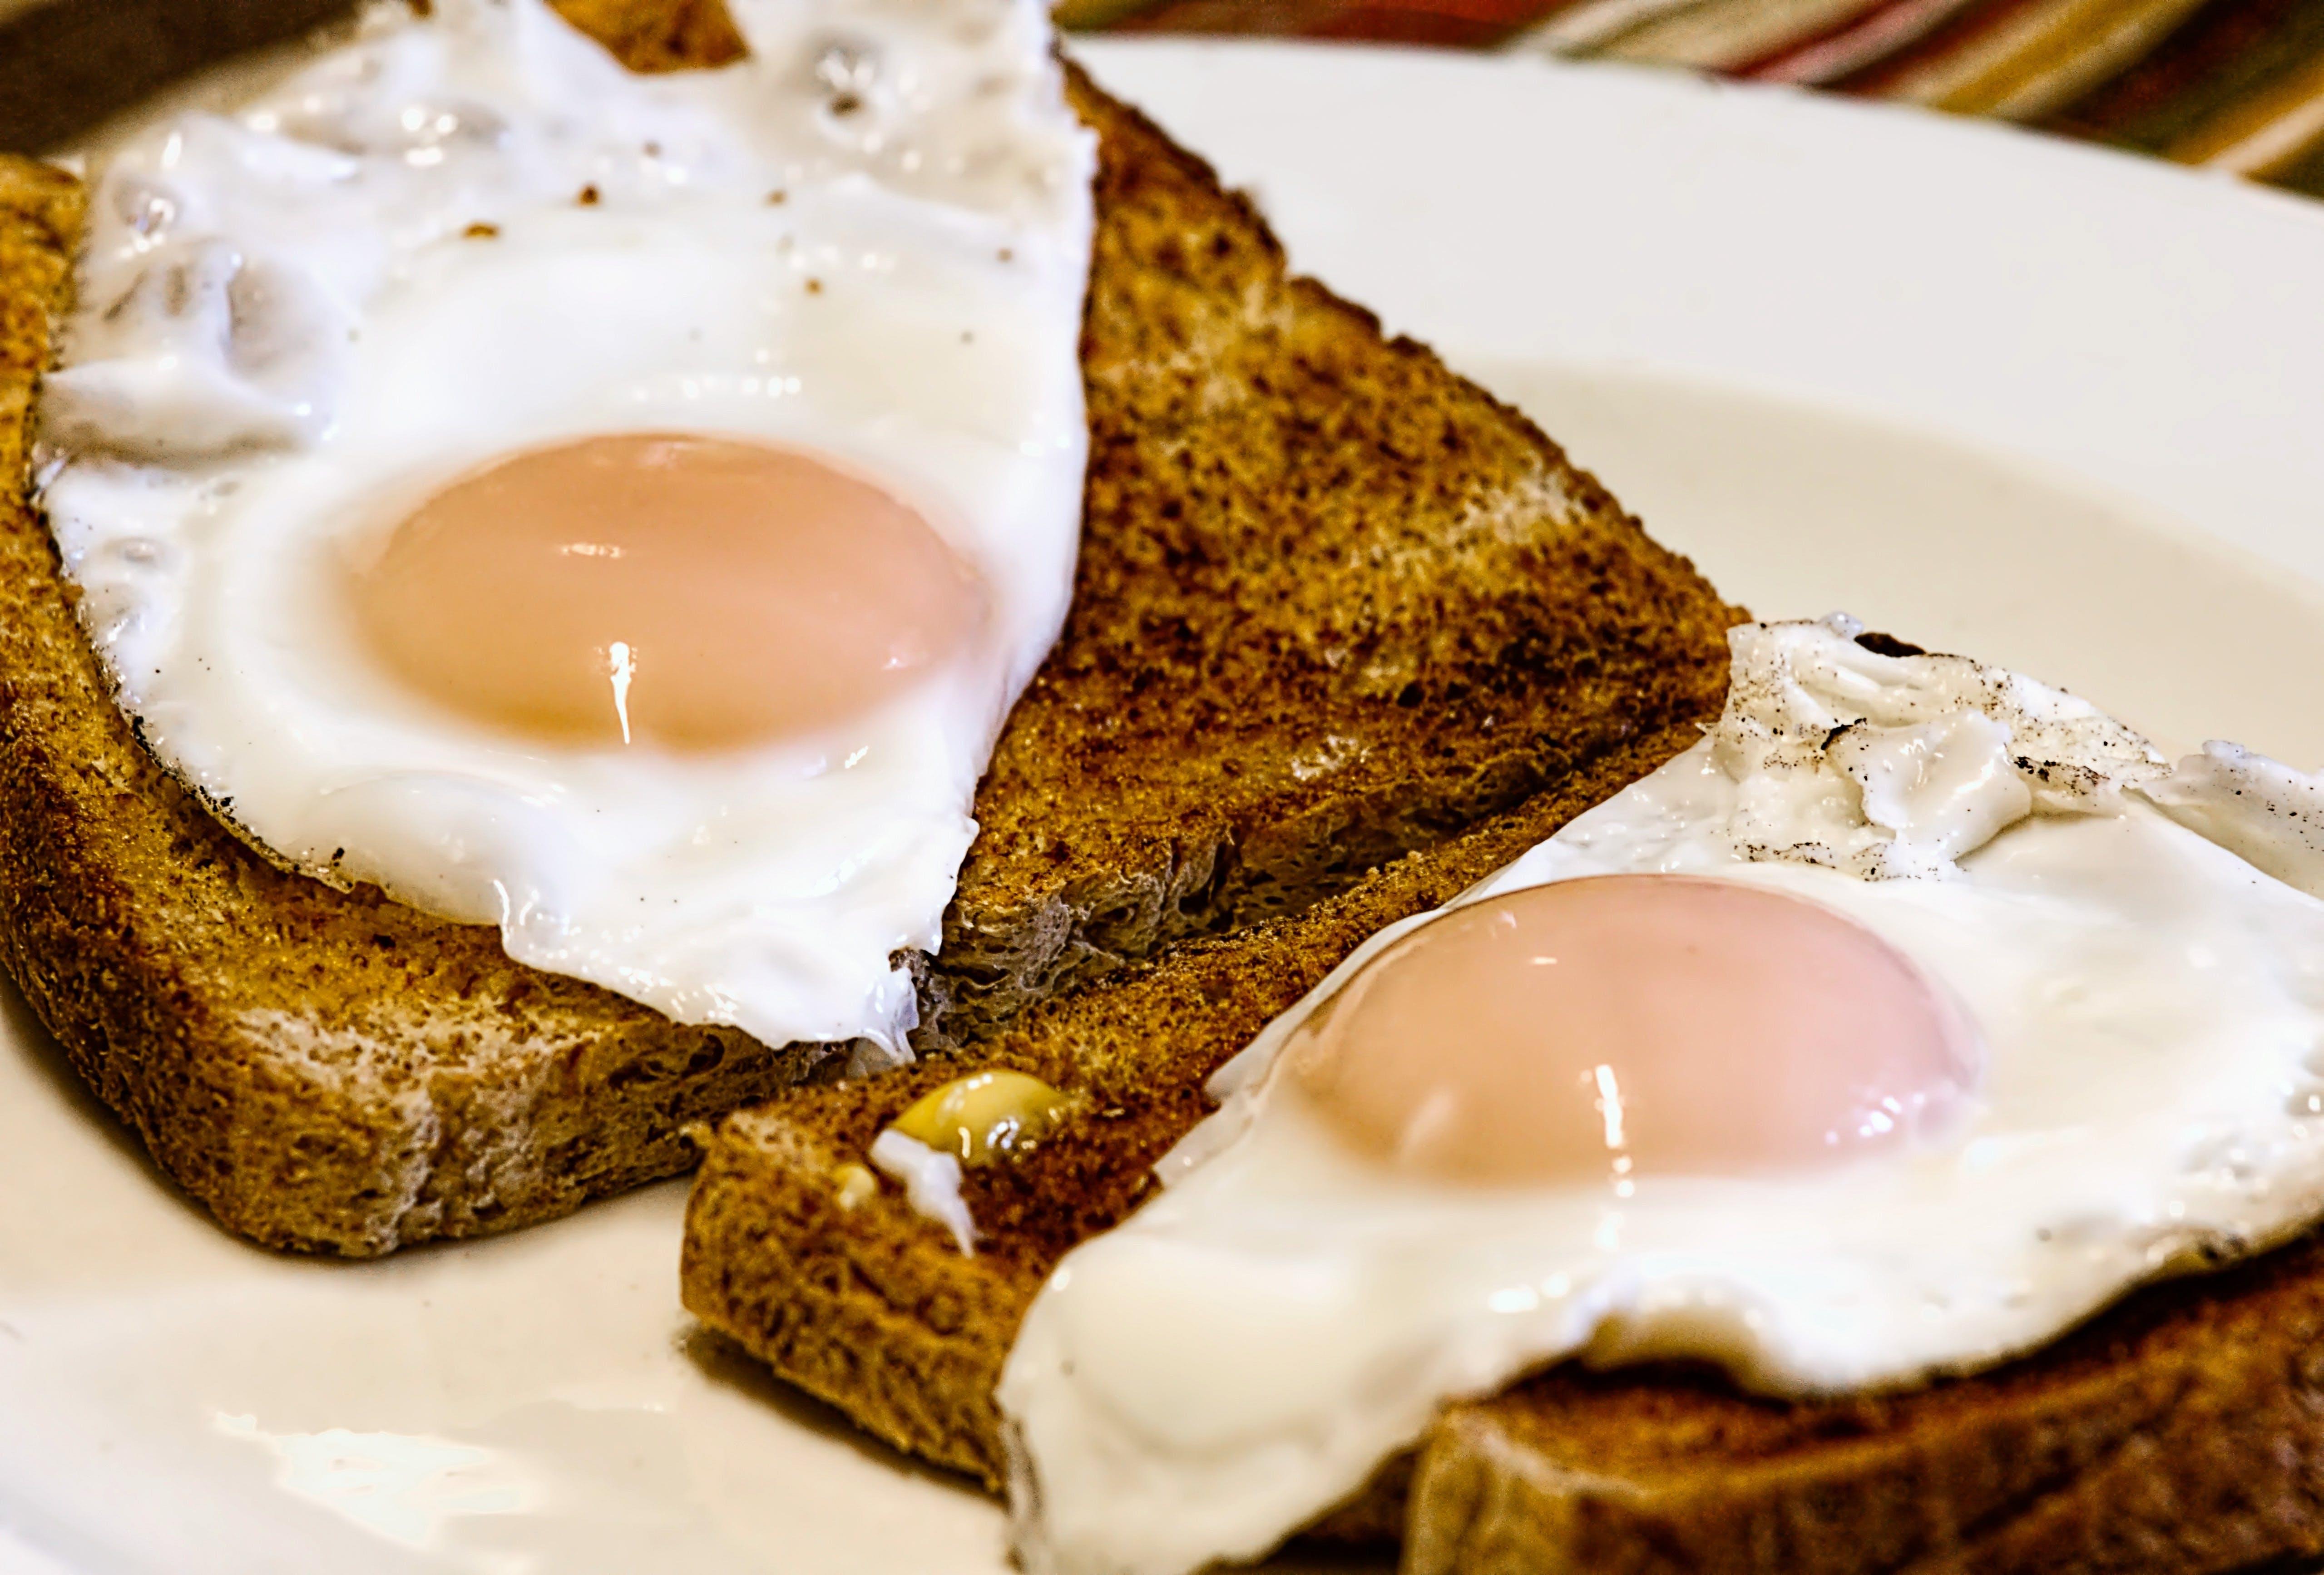 Kostenloses Stock Foto zu cholesterin, ei, eier, eigelb